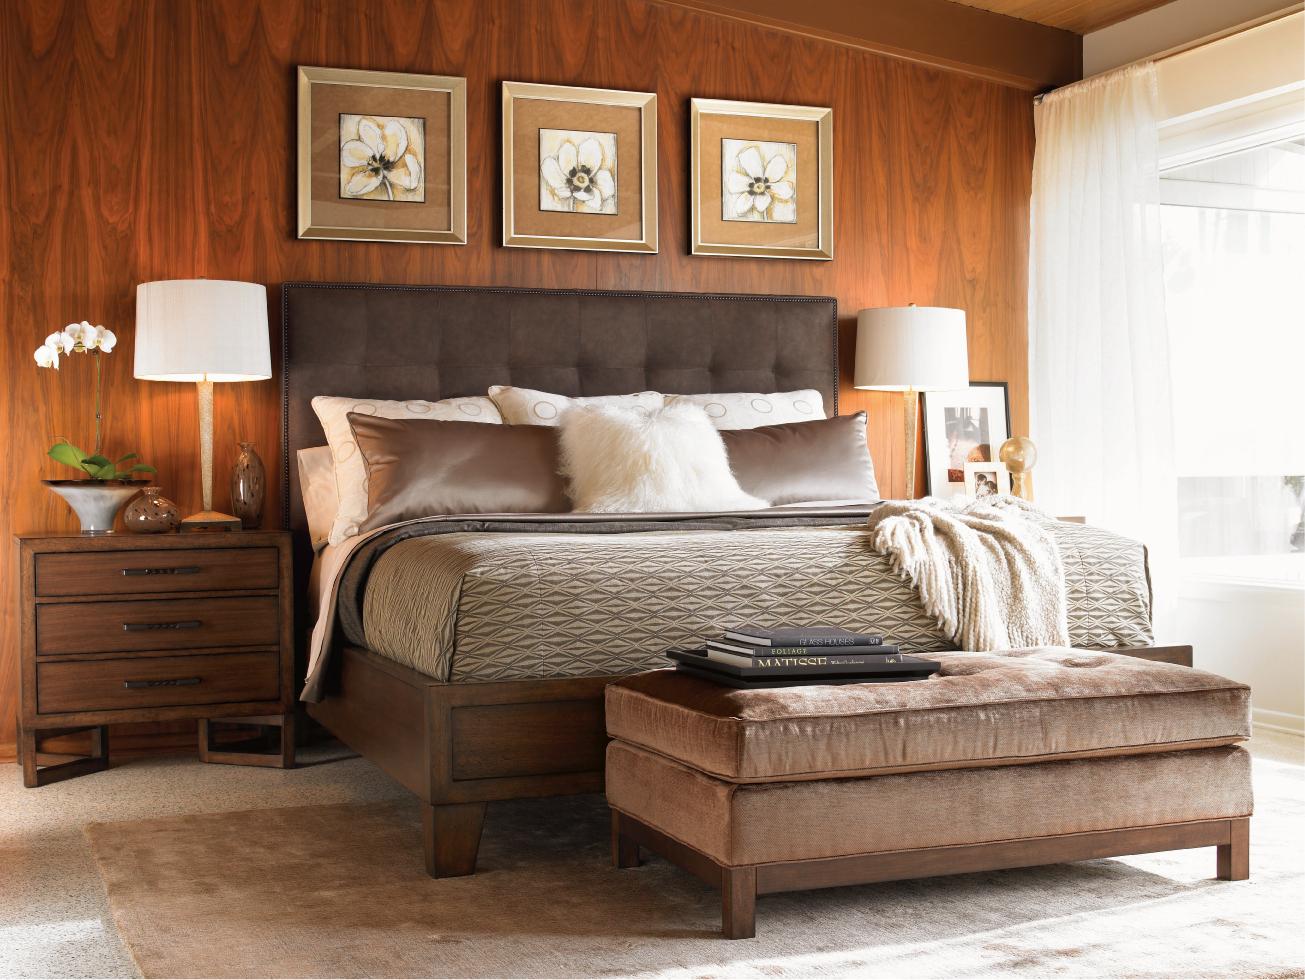 Osmond Designs: Design Ideas